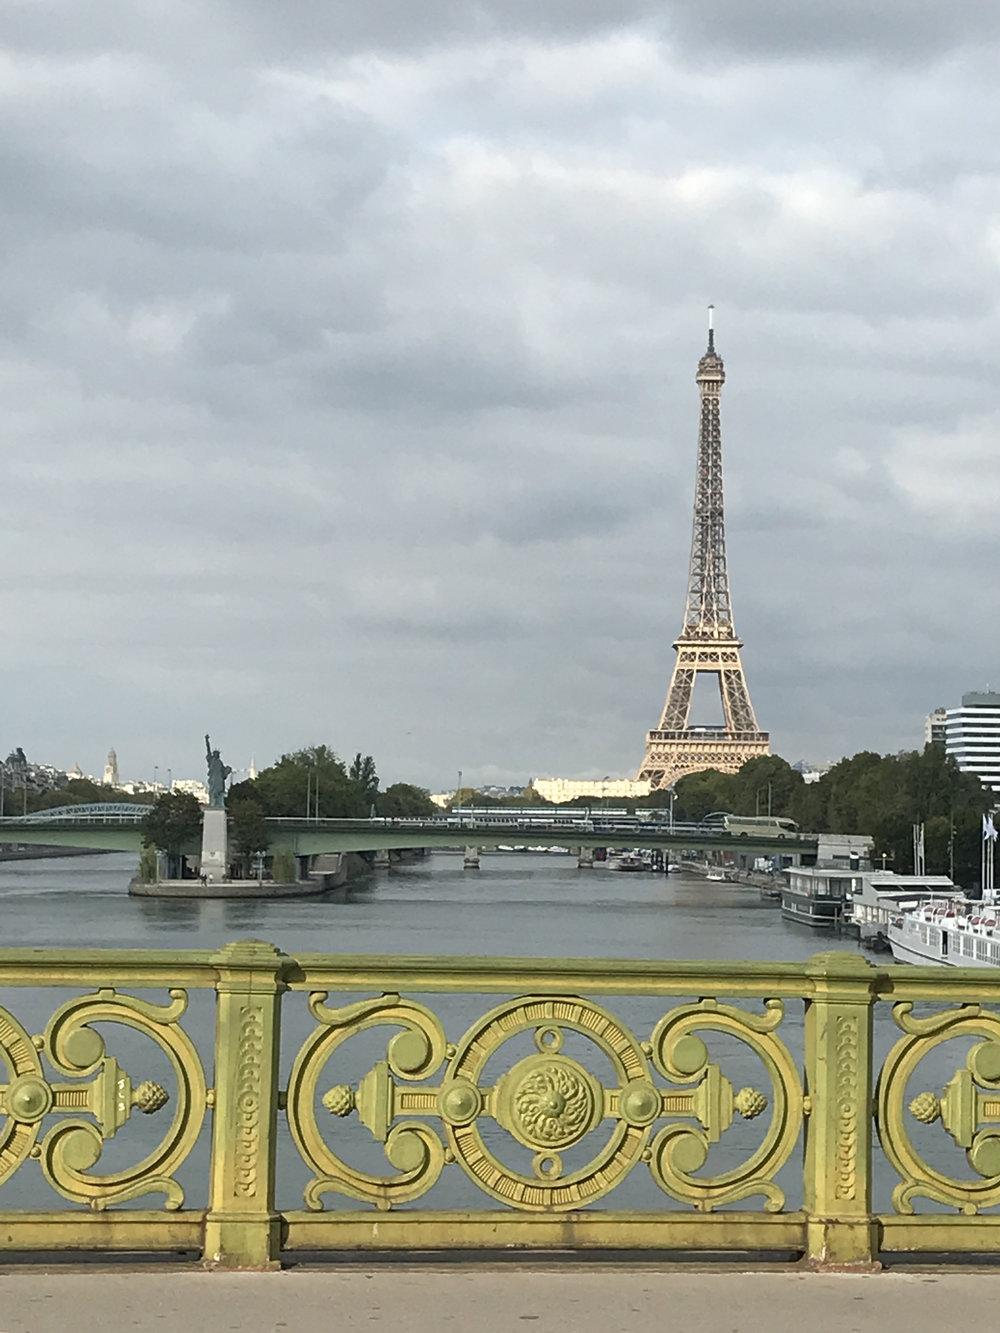 teri_Paris_laura'sbd_monet_giverny_l'orangerie_spiritedtable_photo02.jpg